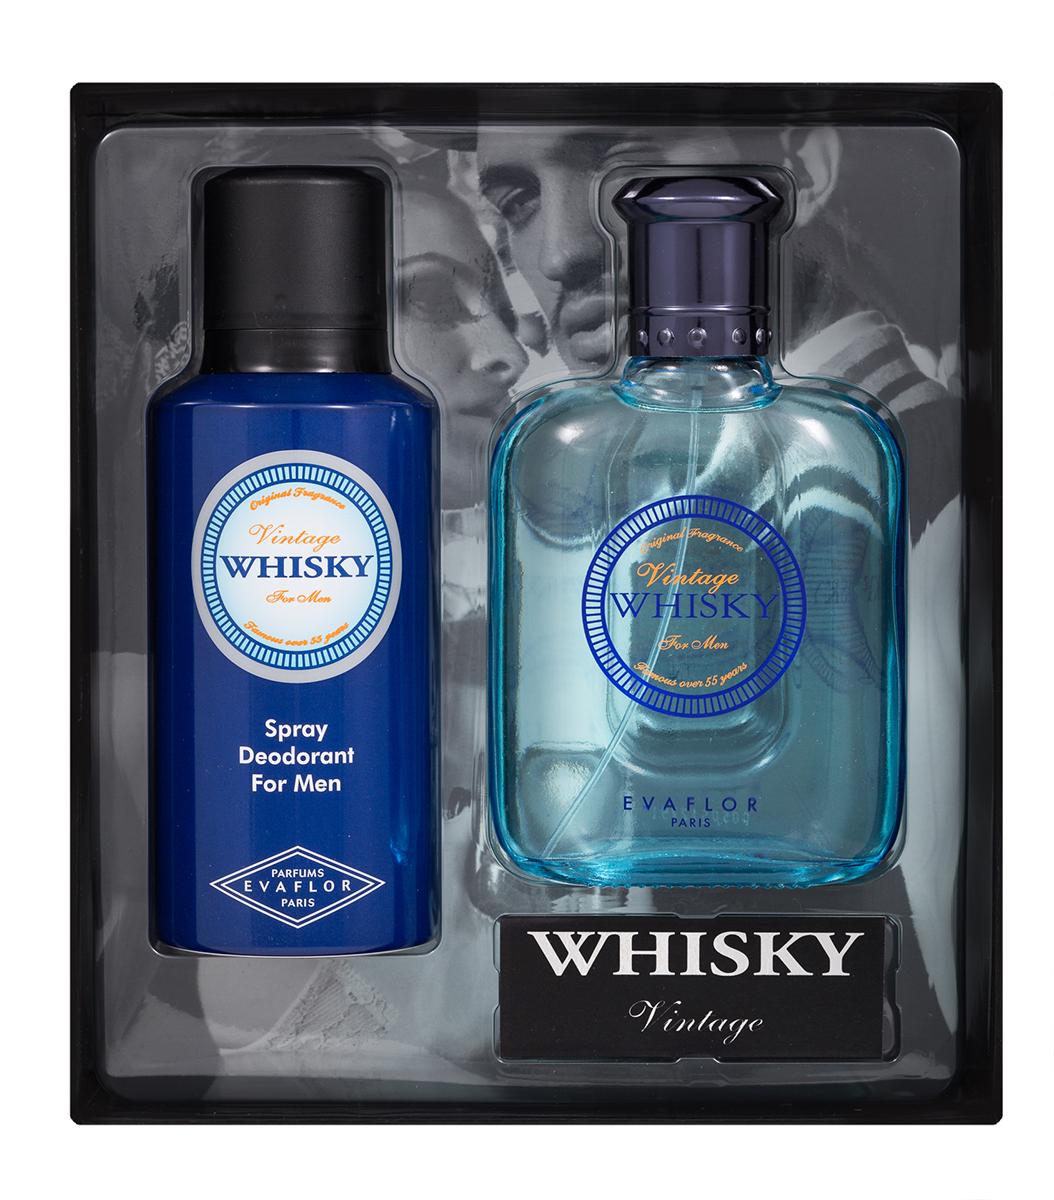 Evaflor Подарочный набор Whisky Vintage мужской: Туалетная вода,100 мл ,дезодорант, 150 мл туалетная вода 30 мл elizabeth arden туалетная вода 30 мл